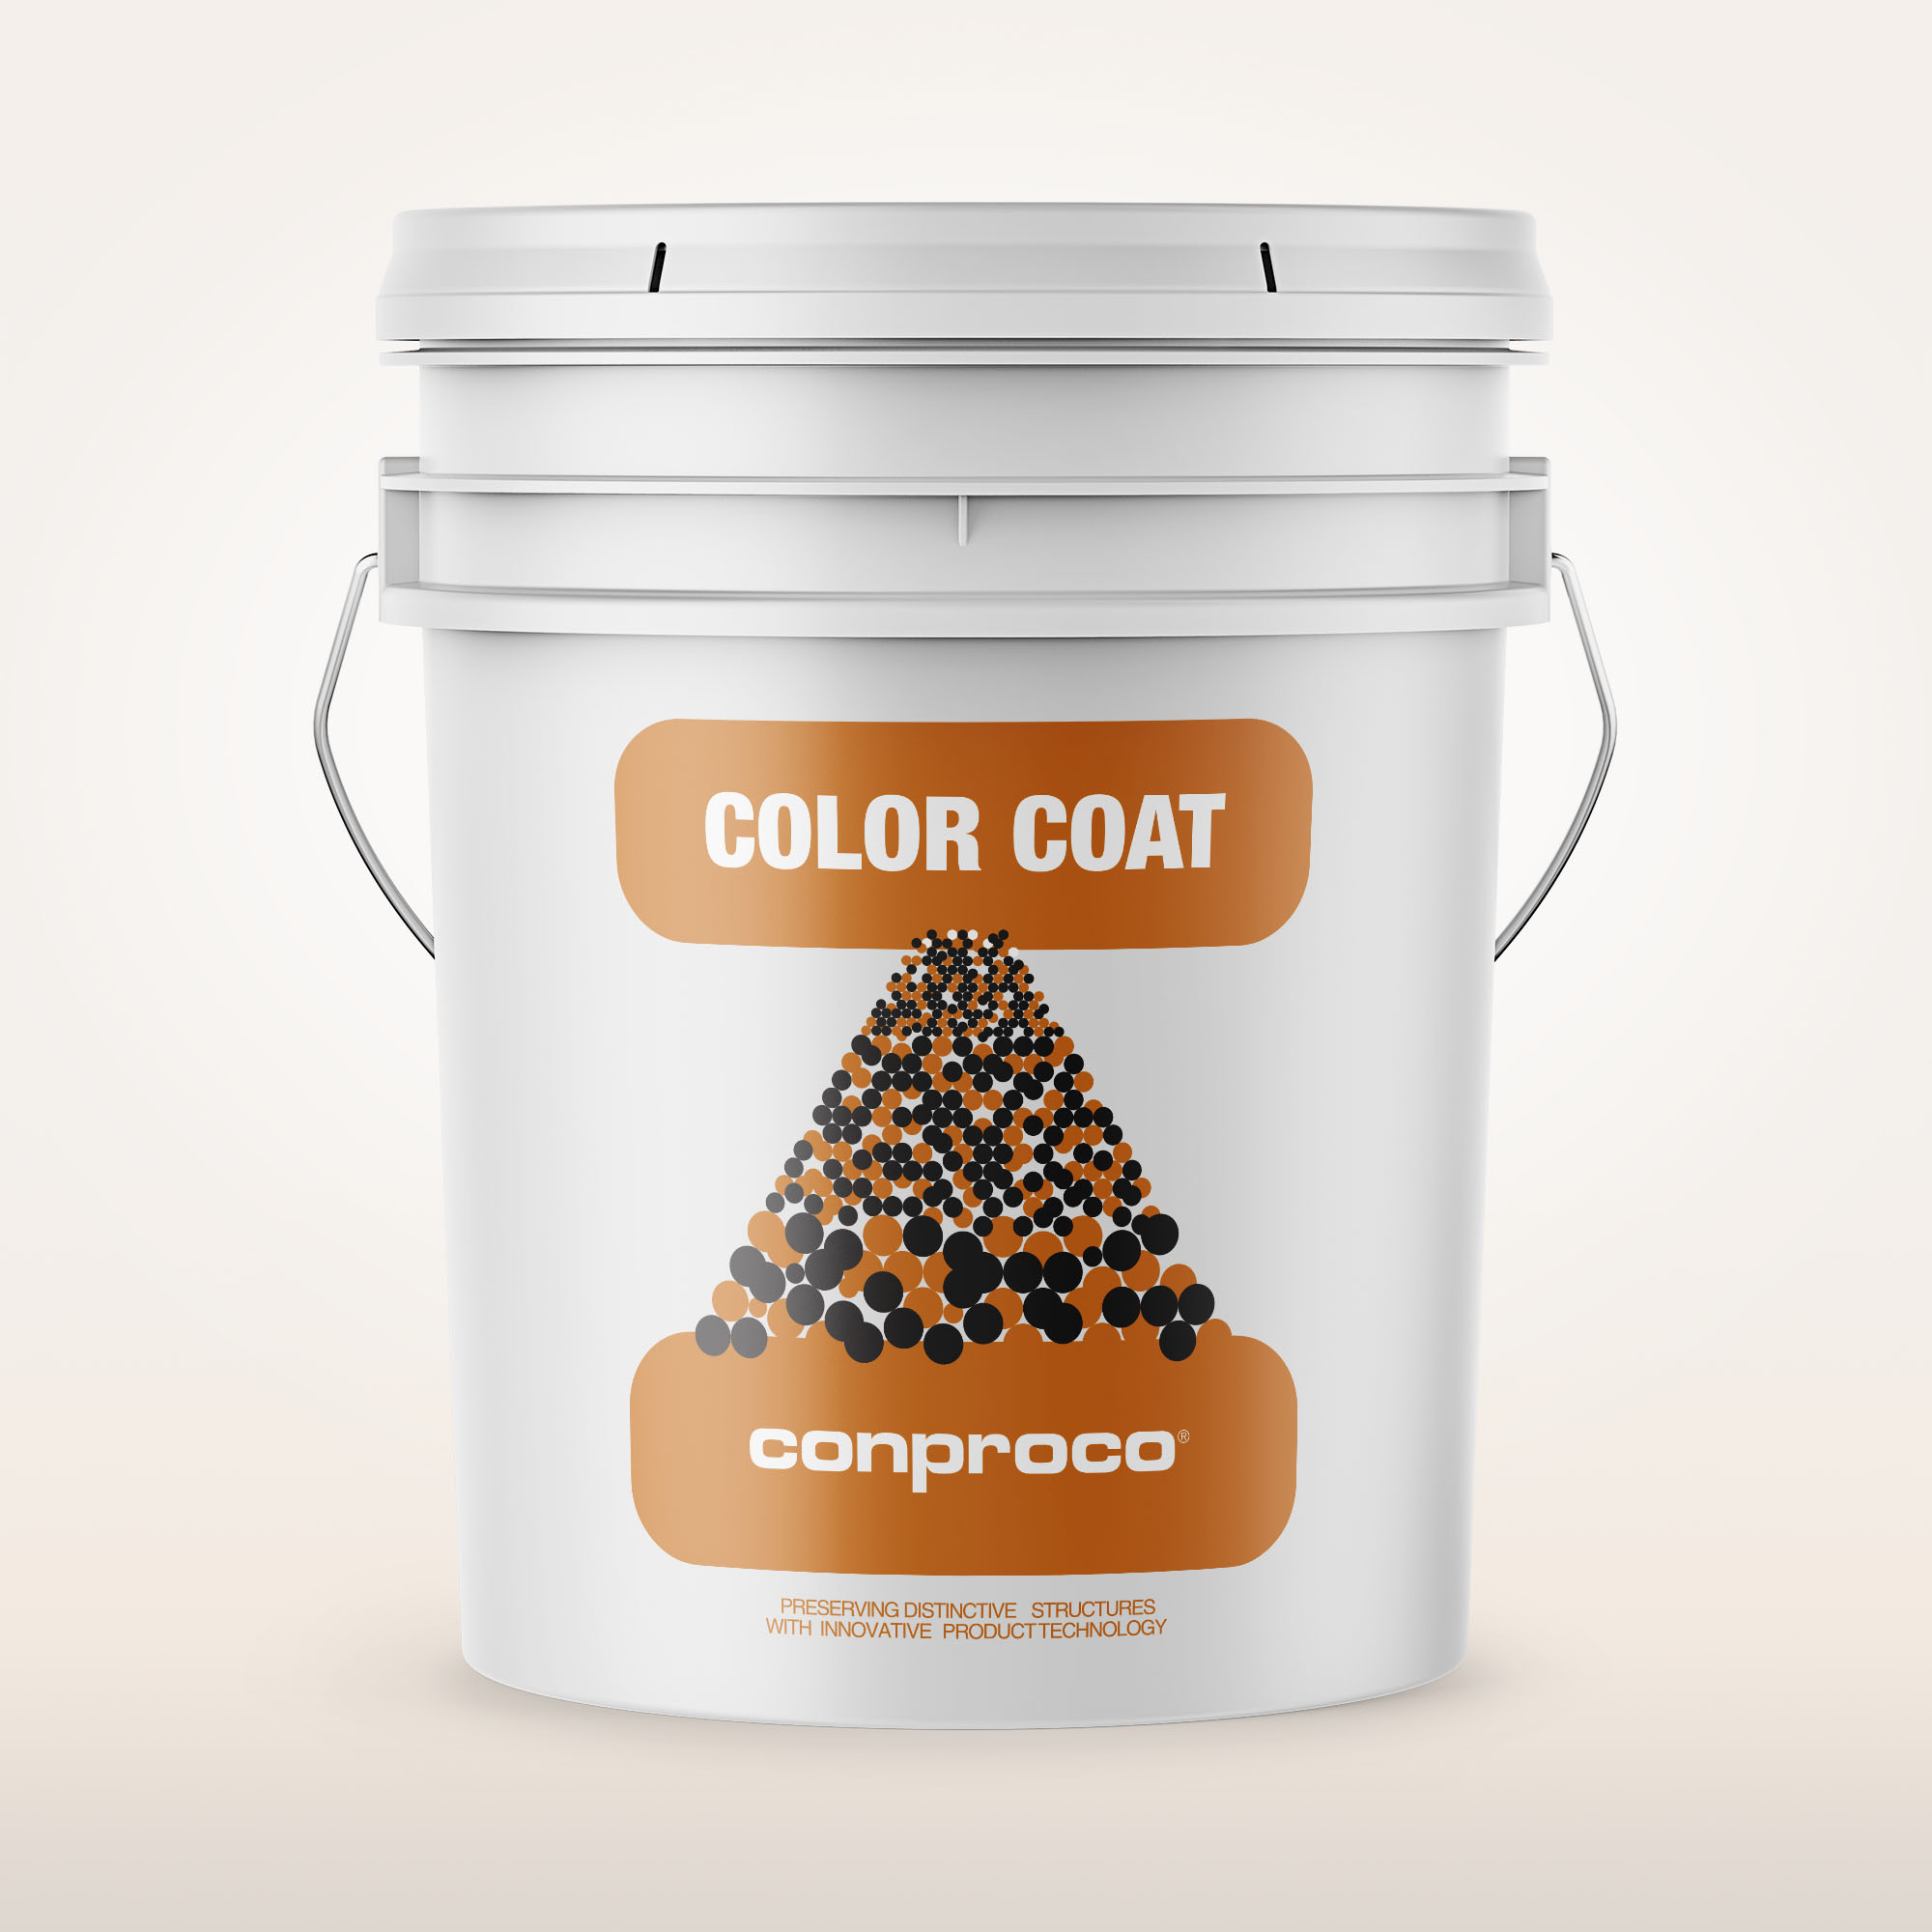 Color Coat 5 gallon bucket of paint for concrete masonry units